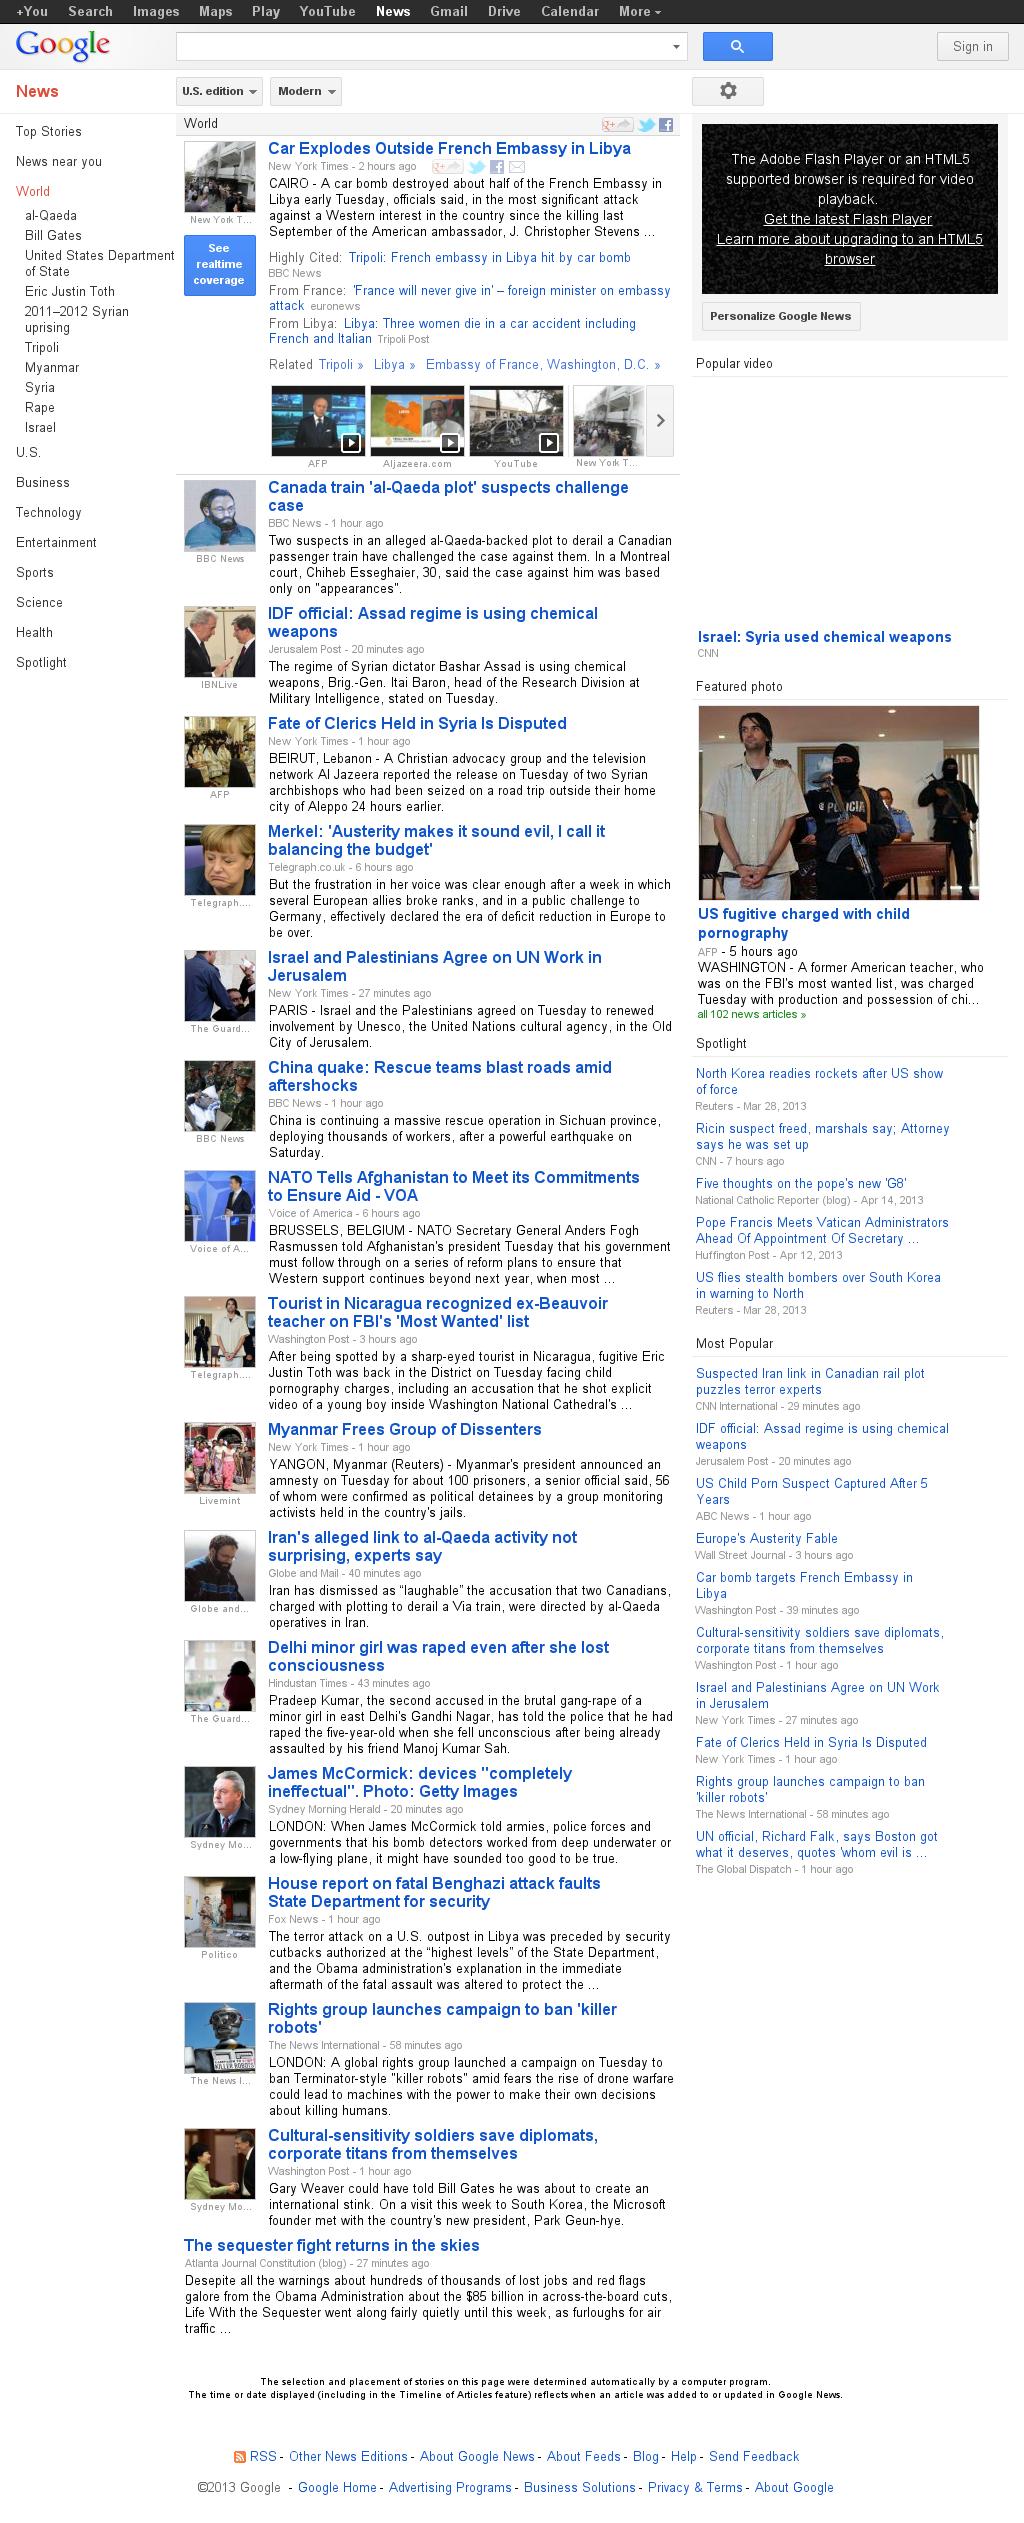 Google News: World at Wednesday April 24, 2013, 3:11 a.m. UTC